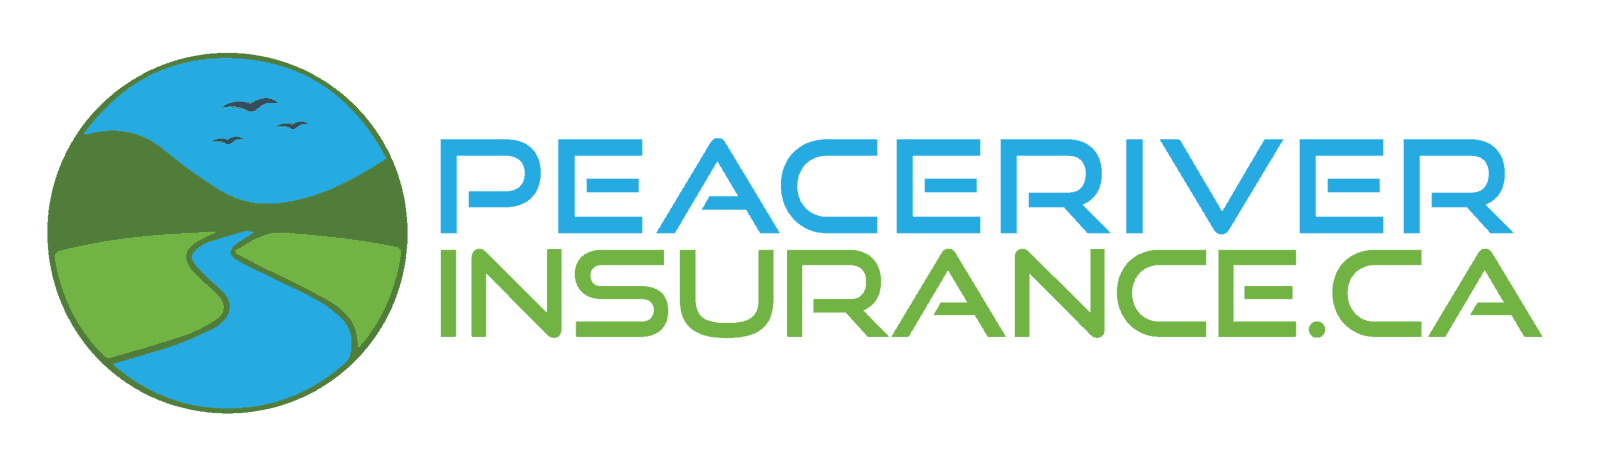 Peace River insurance